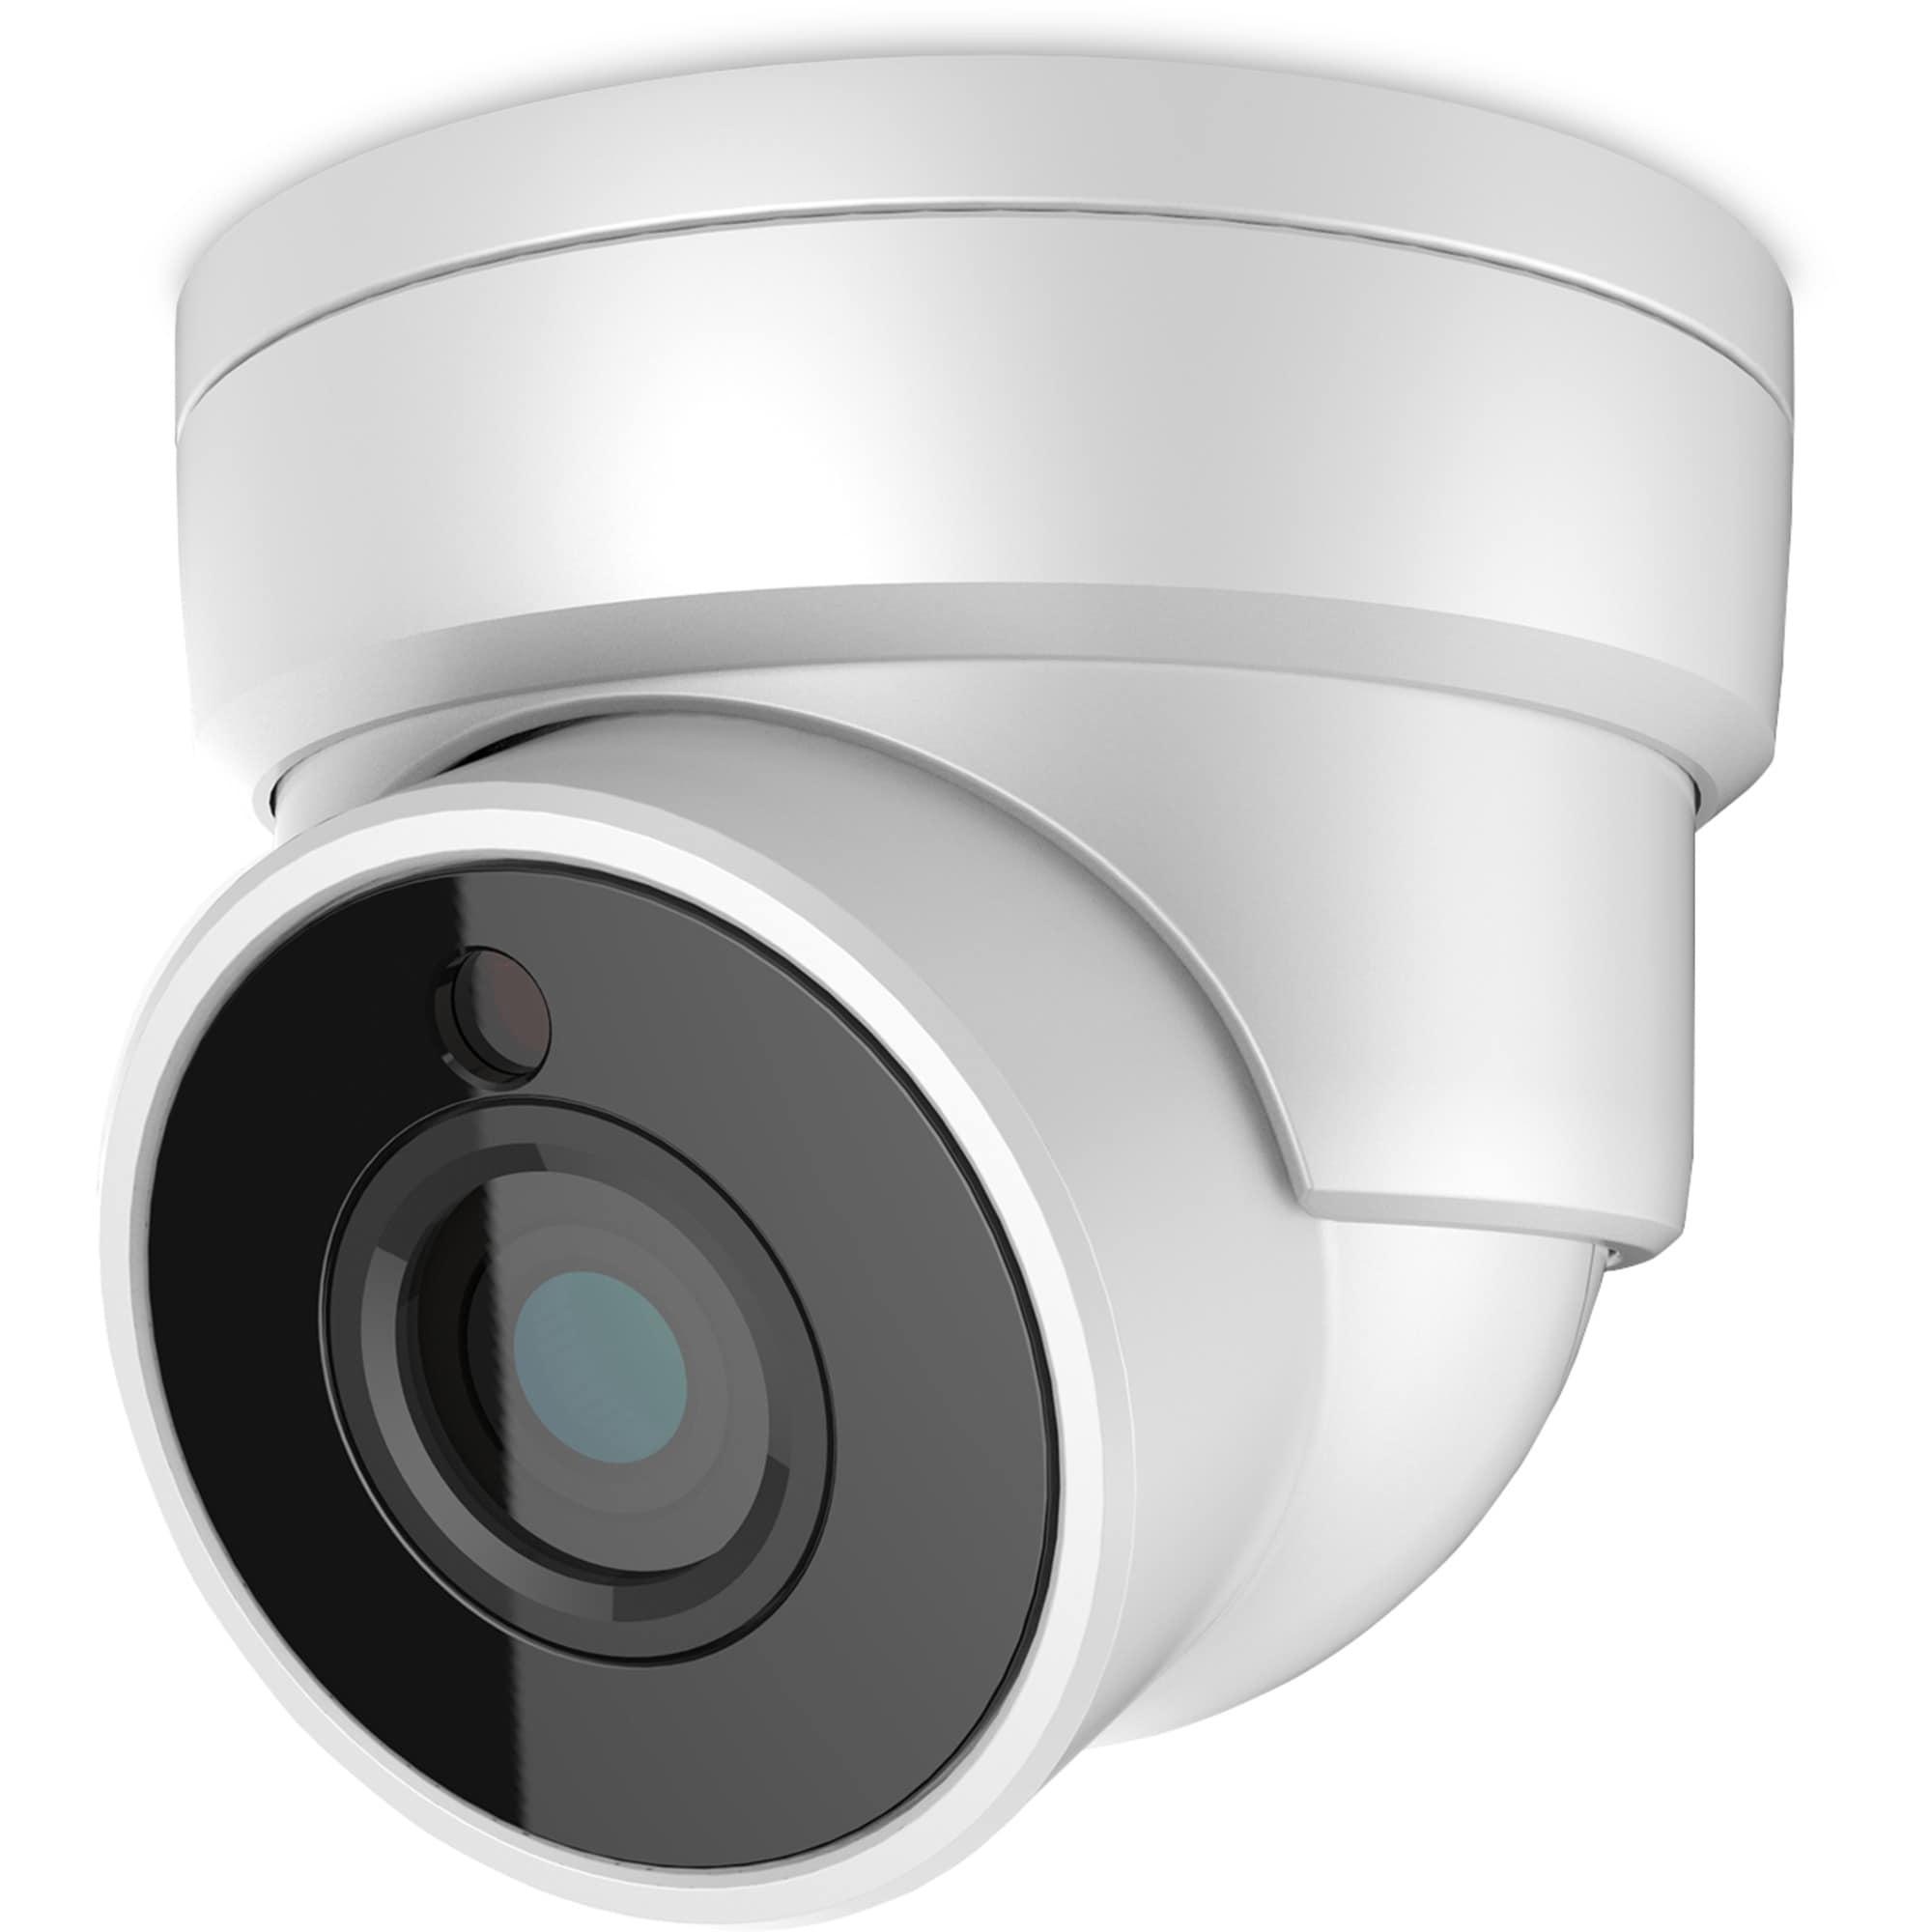 Digitus Überwachungskamera Full HD Hybrid AHD und IP Netzwerk Video Rekorder Kit